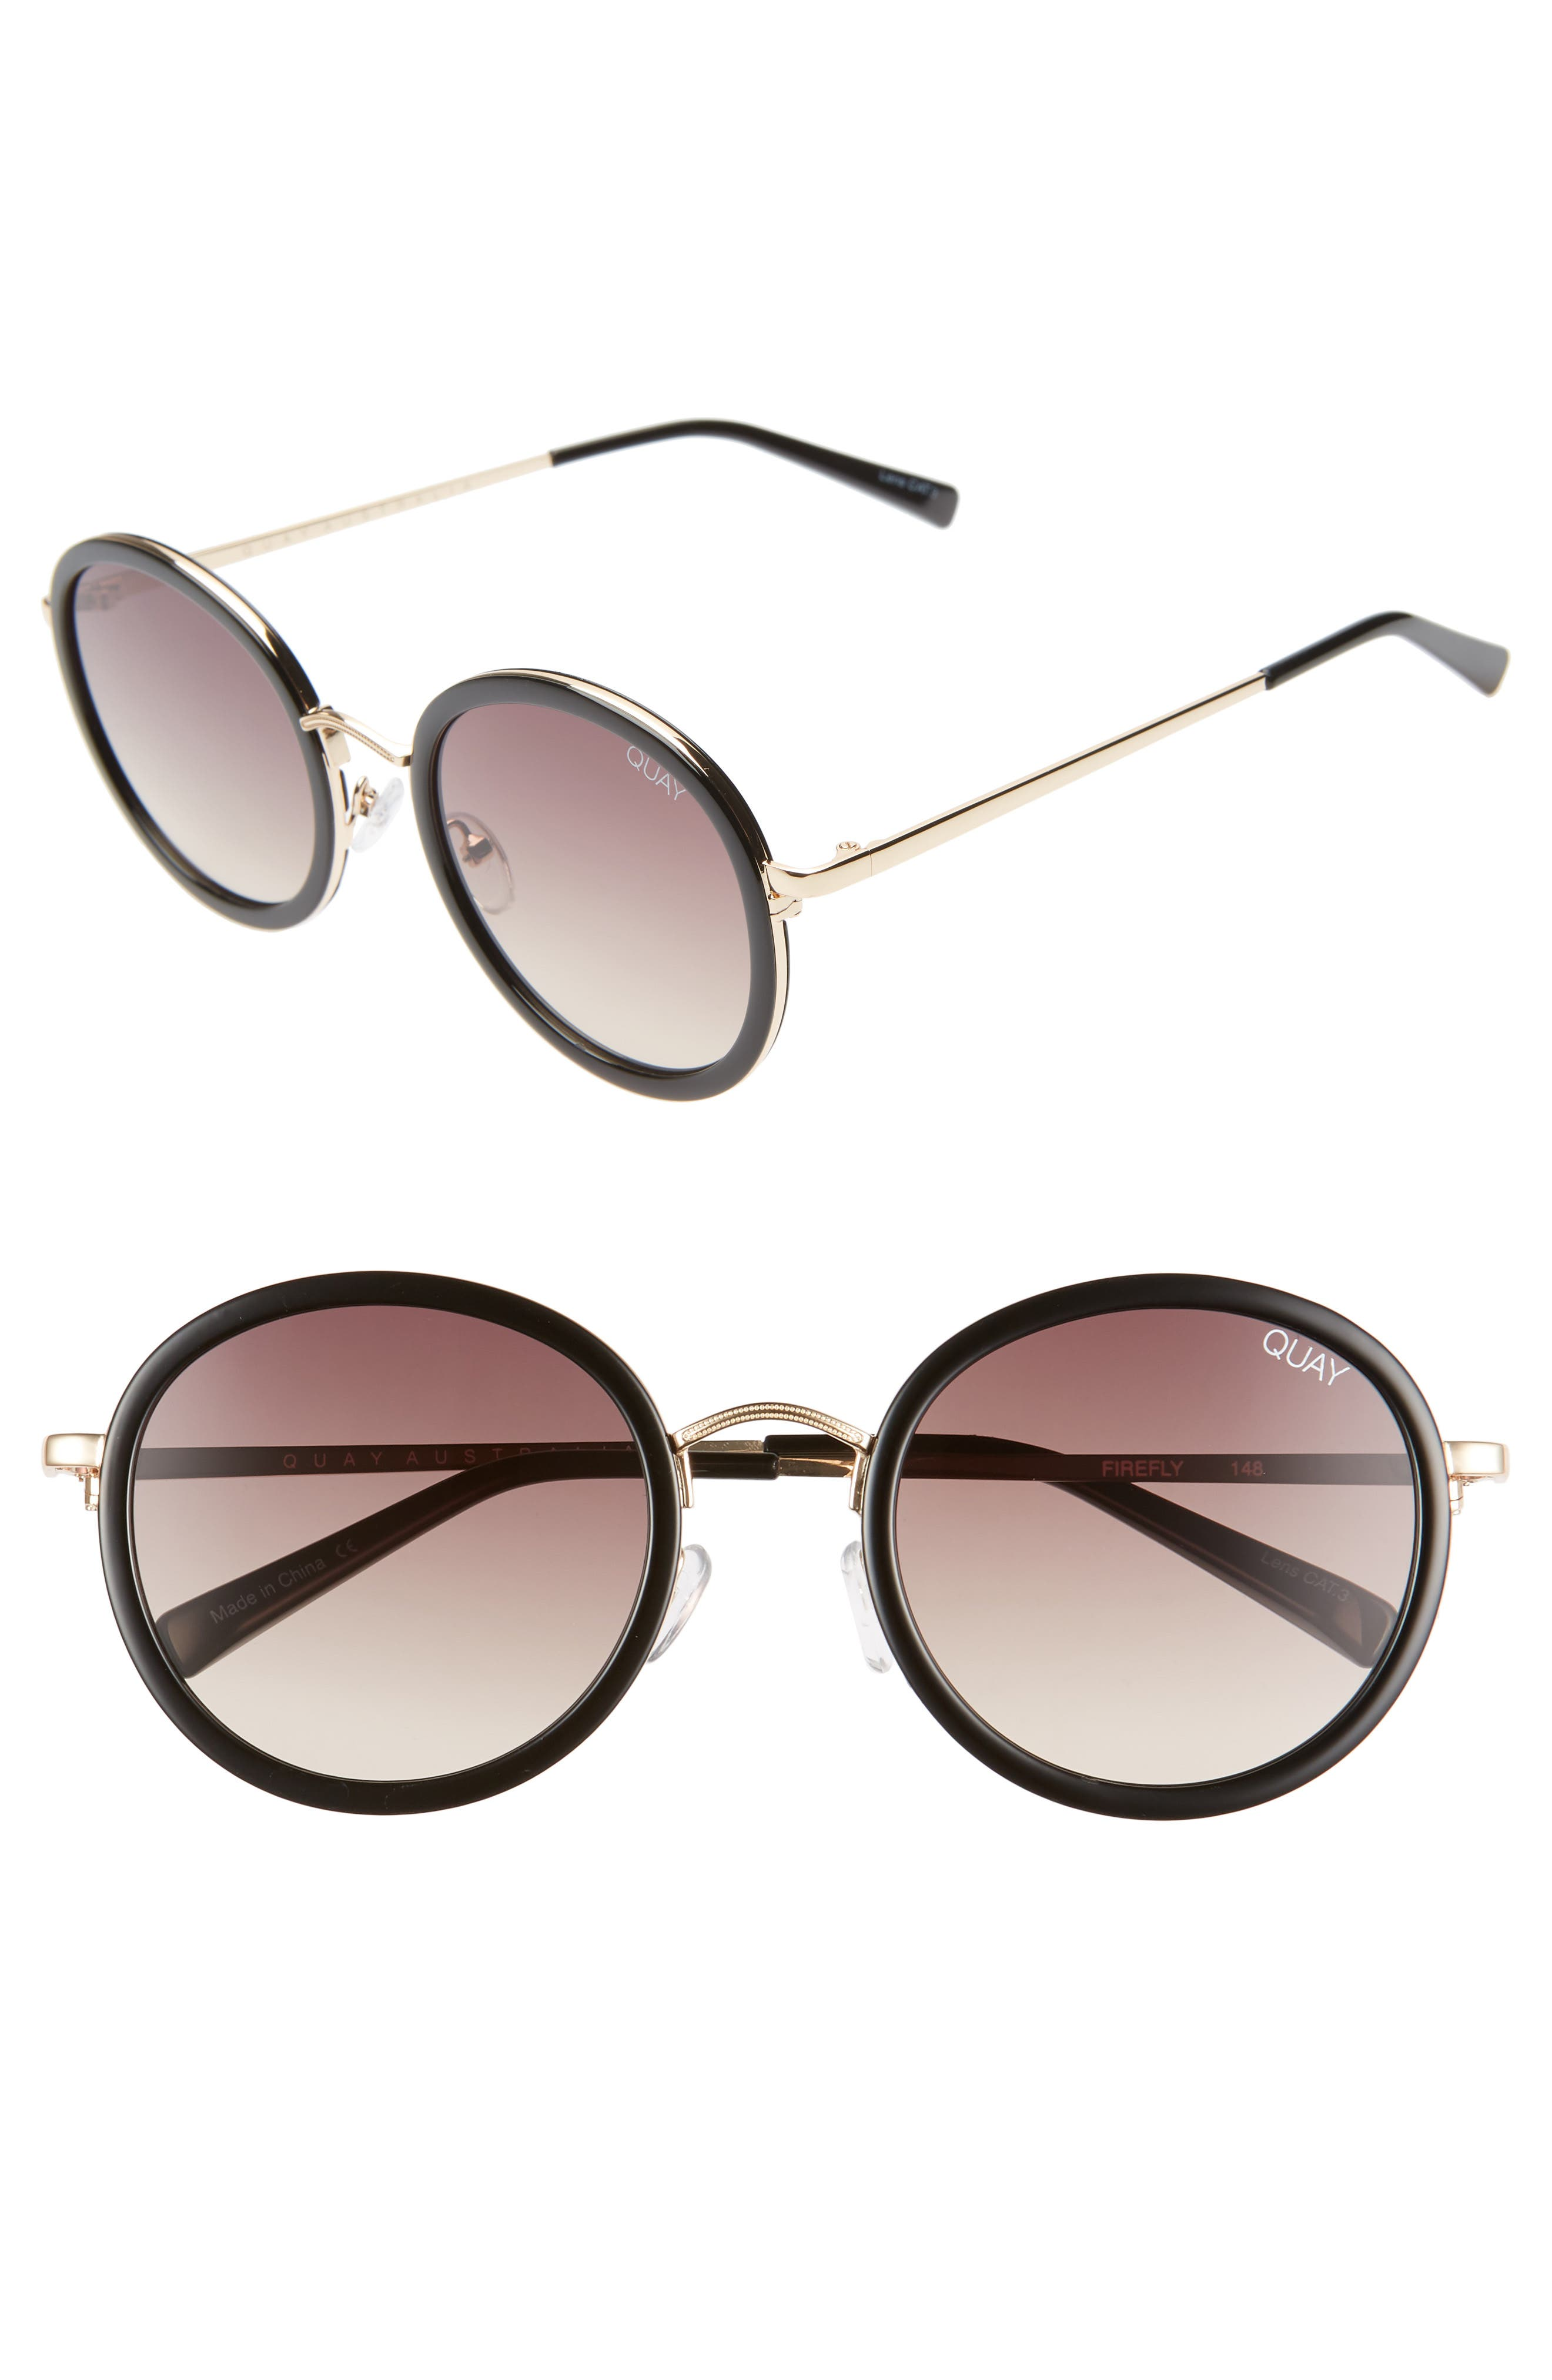 Quay Australia Firefly 52Mm Round Sunglasses - Black/ Brown